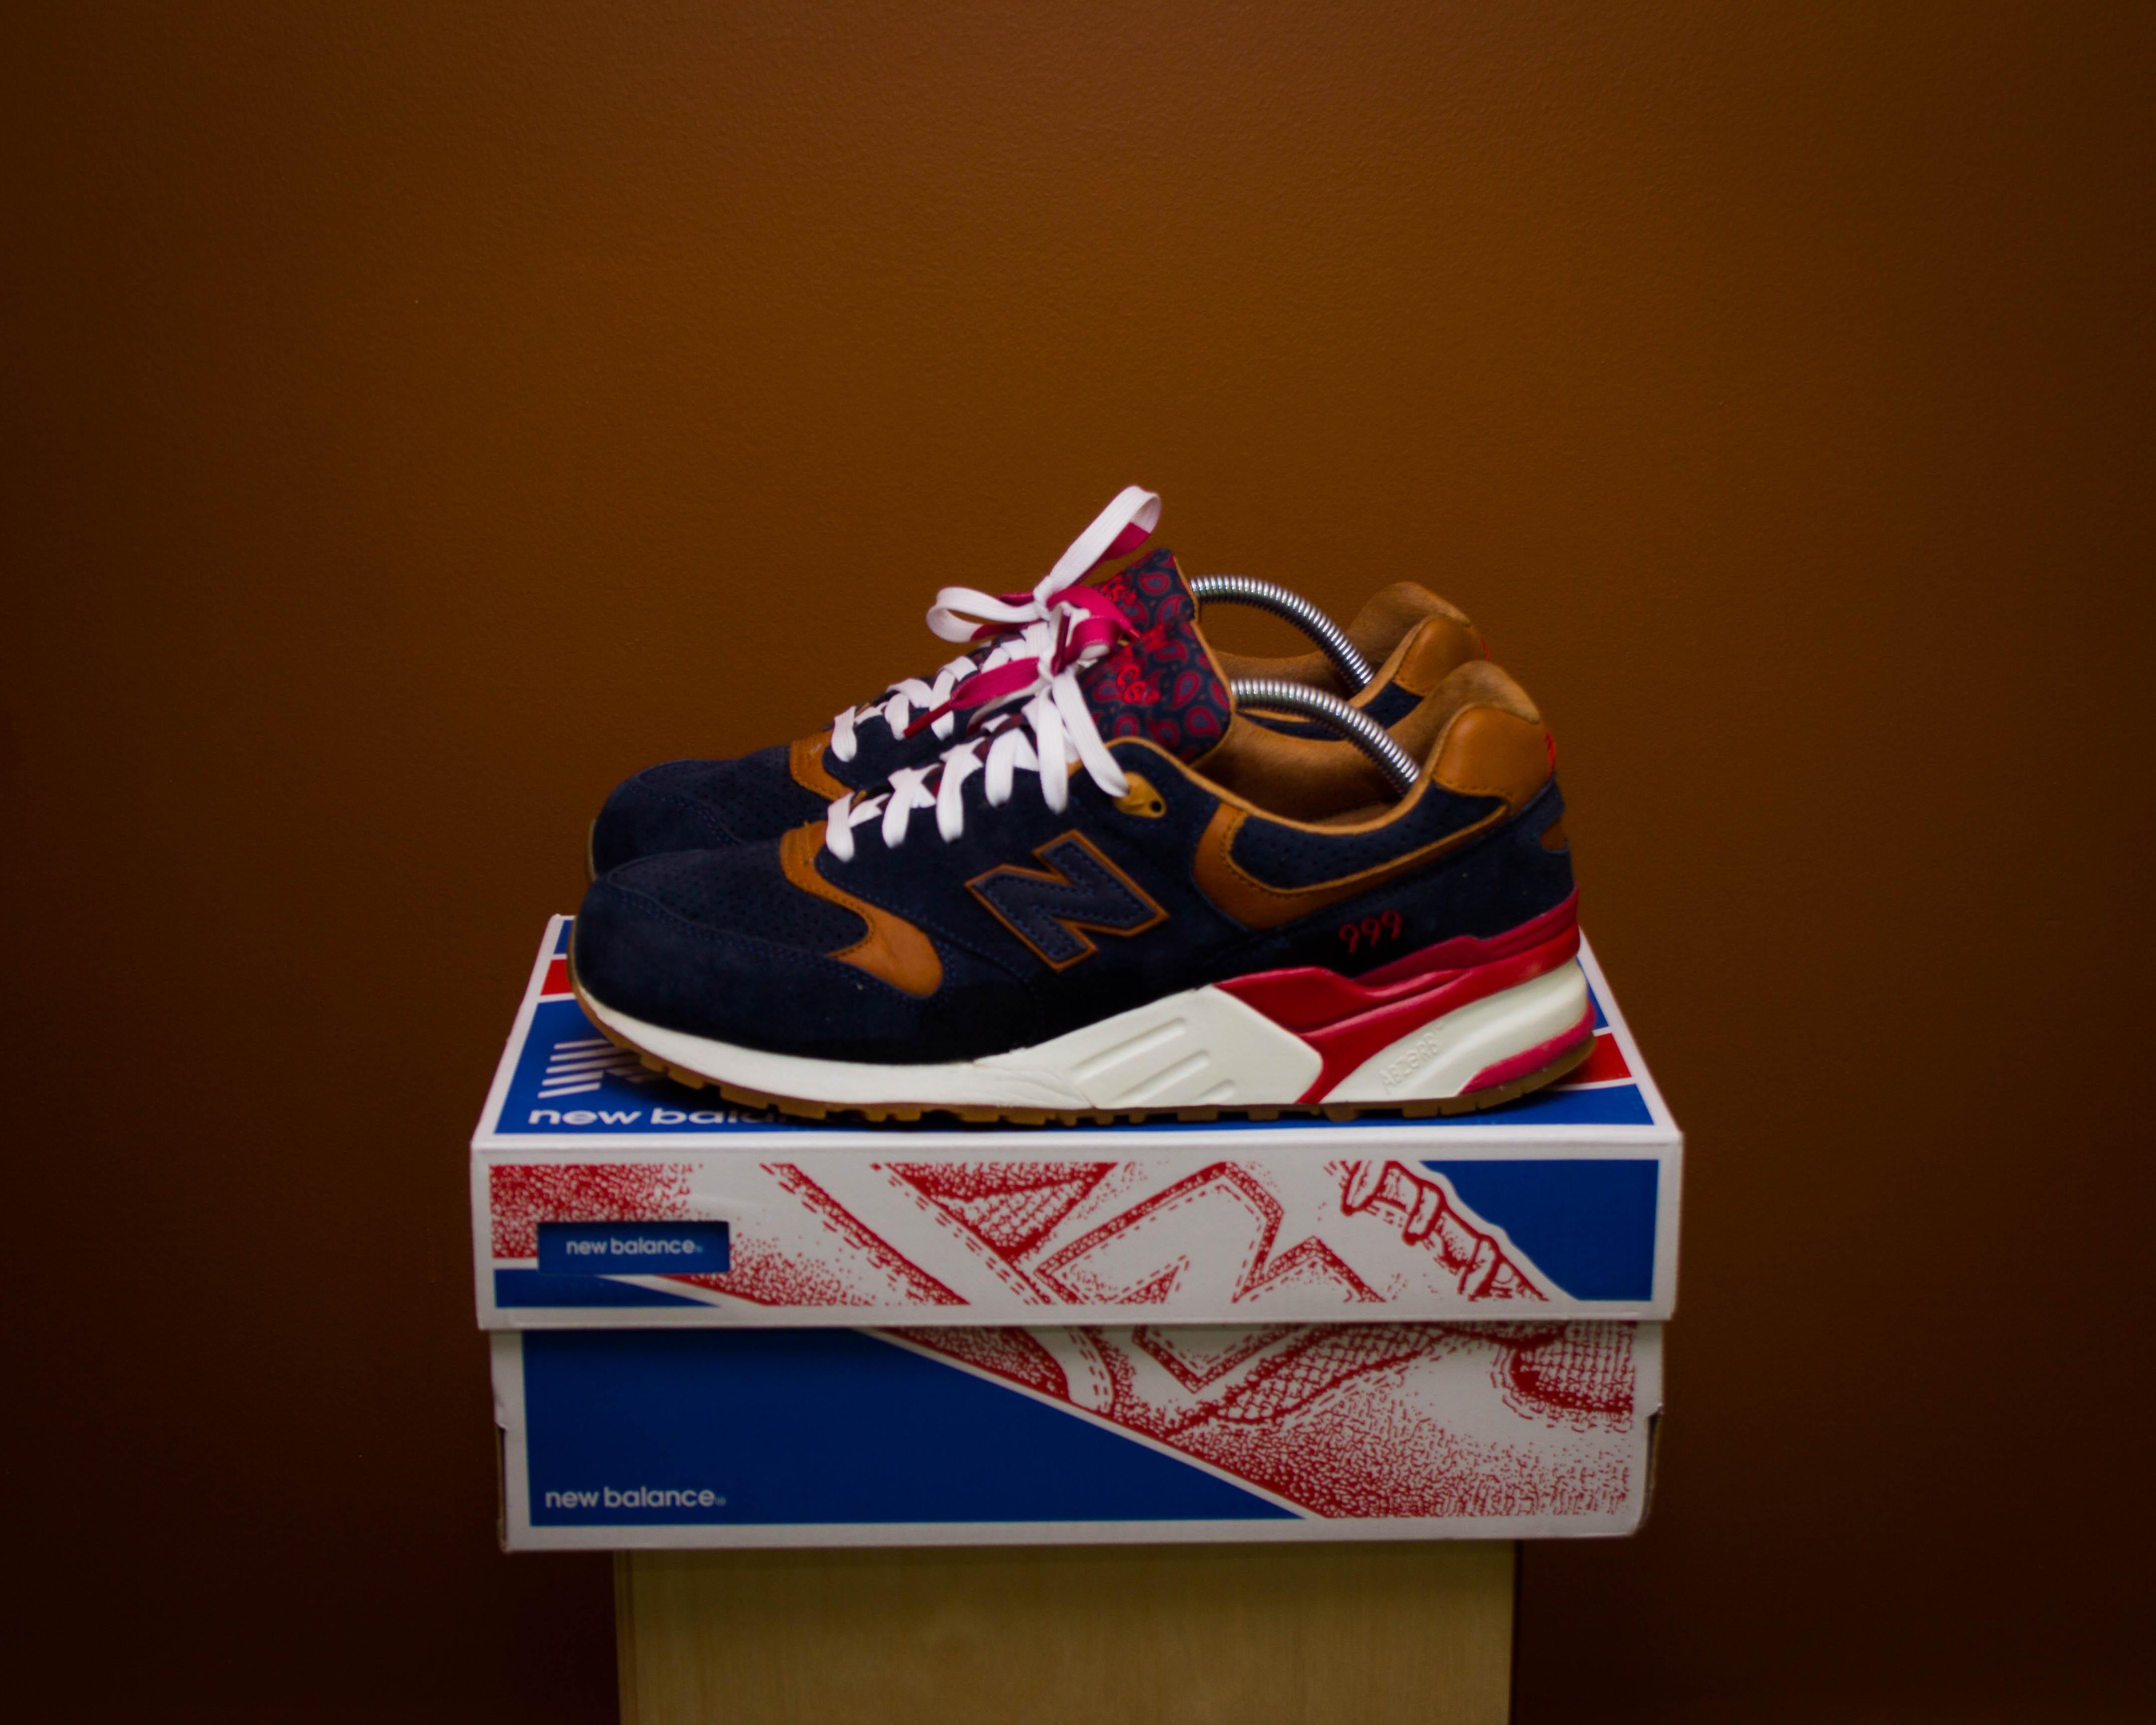 sports shoes 06c51 d9e36 New Balance 999 x Sneaker Politics Detectives Curse